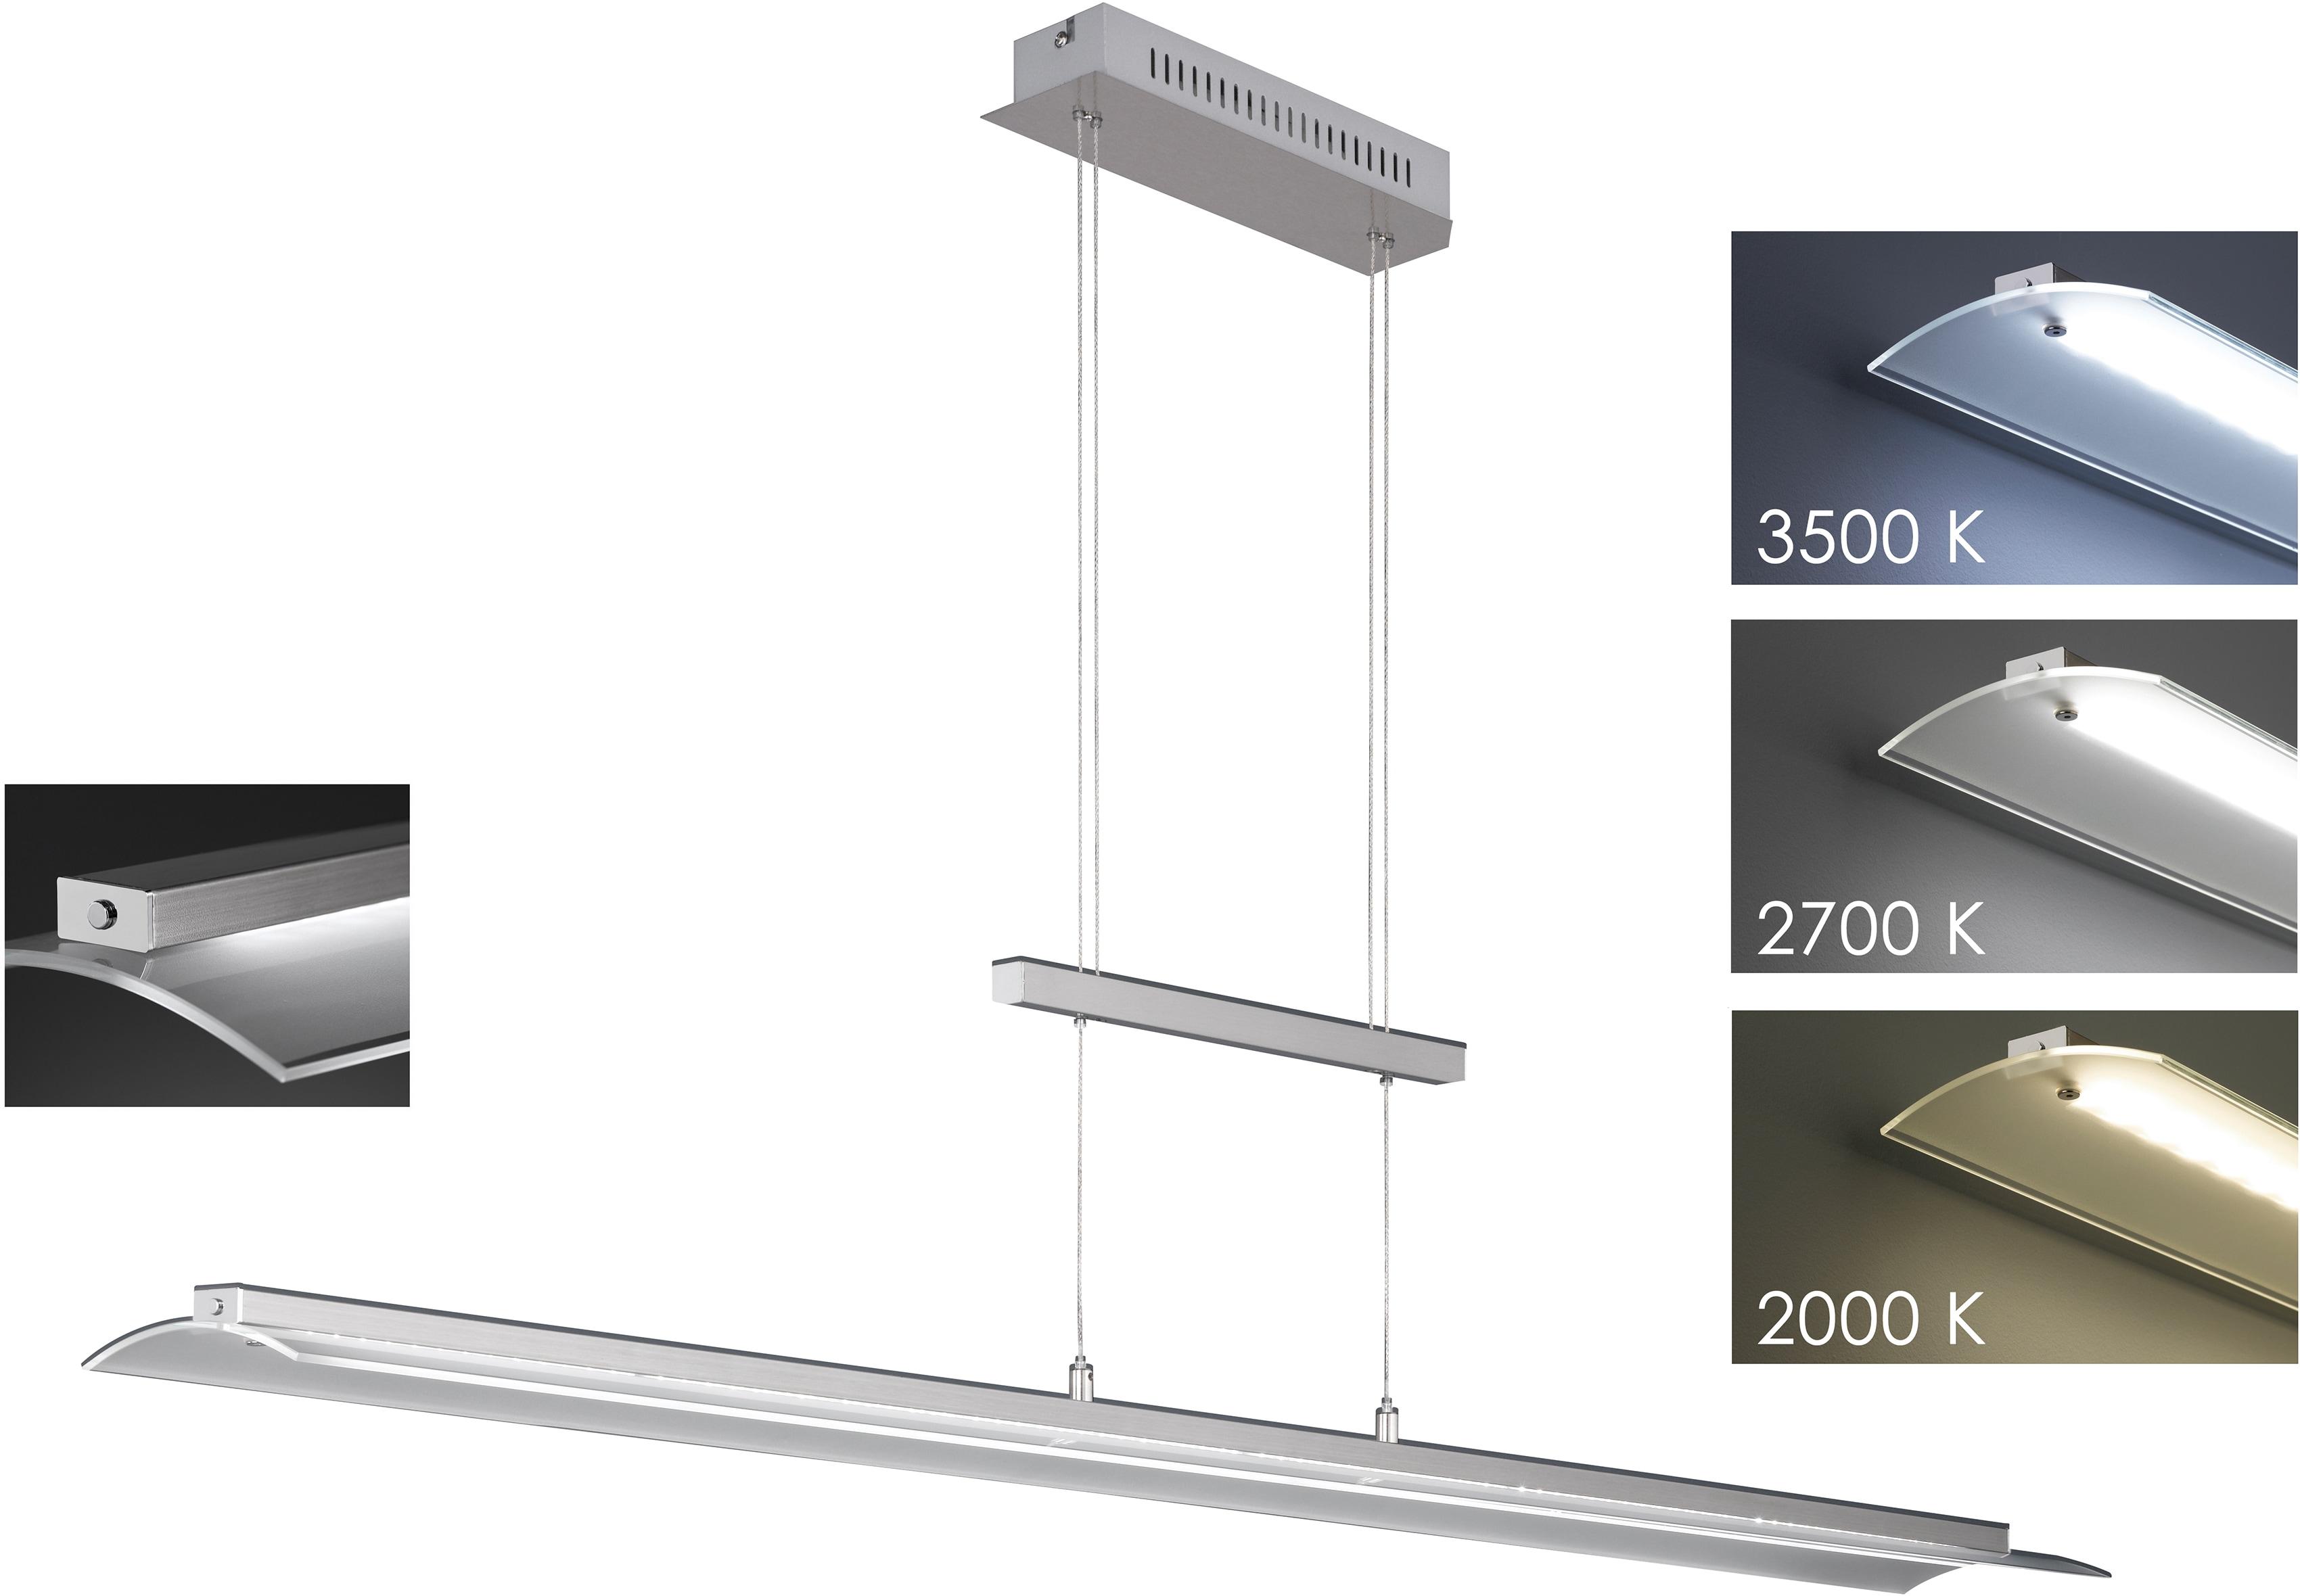 FISCHER & HONSEL LED Pendelleuchte Roof, LED-Modul, Warmweiß-Neutralweiß